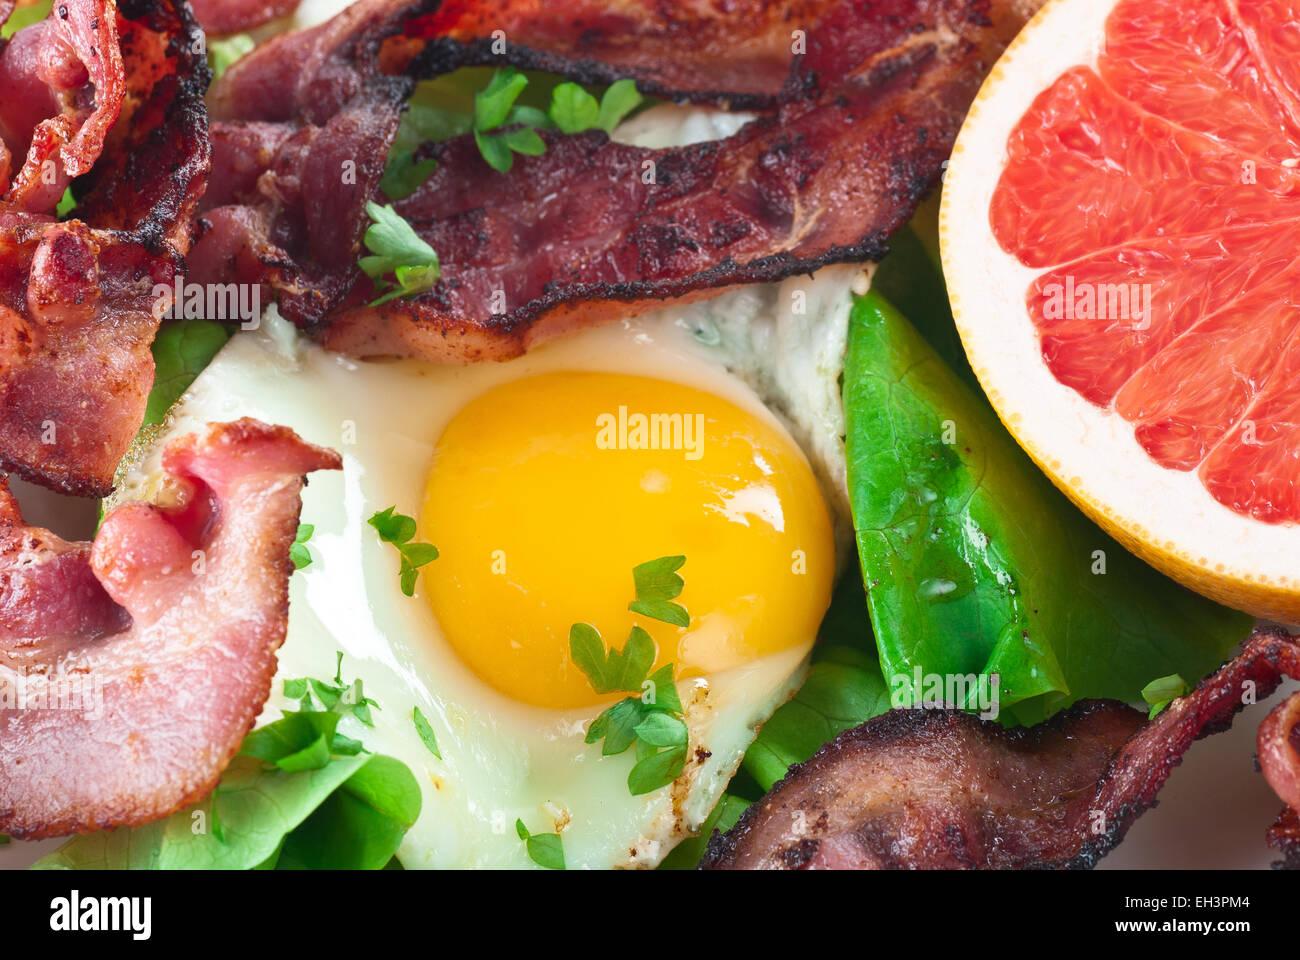 Huevos fritos con bacon, lechuga y toronja. Imagen De Stock